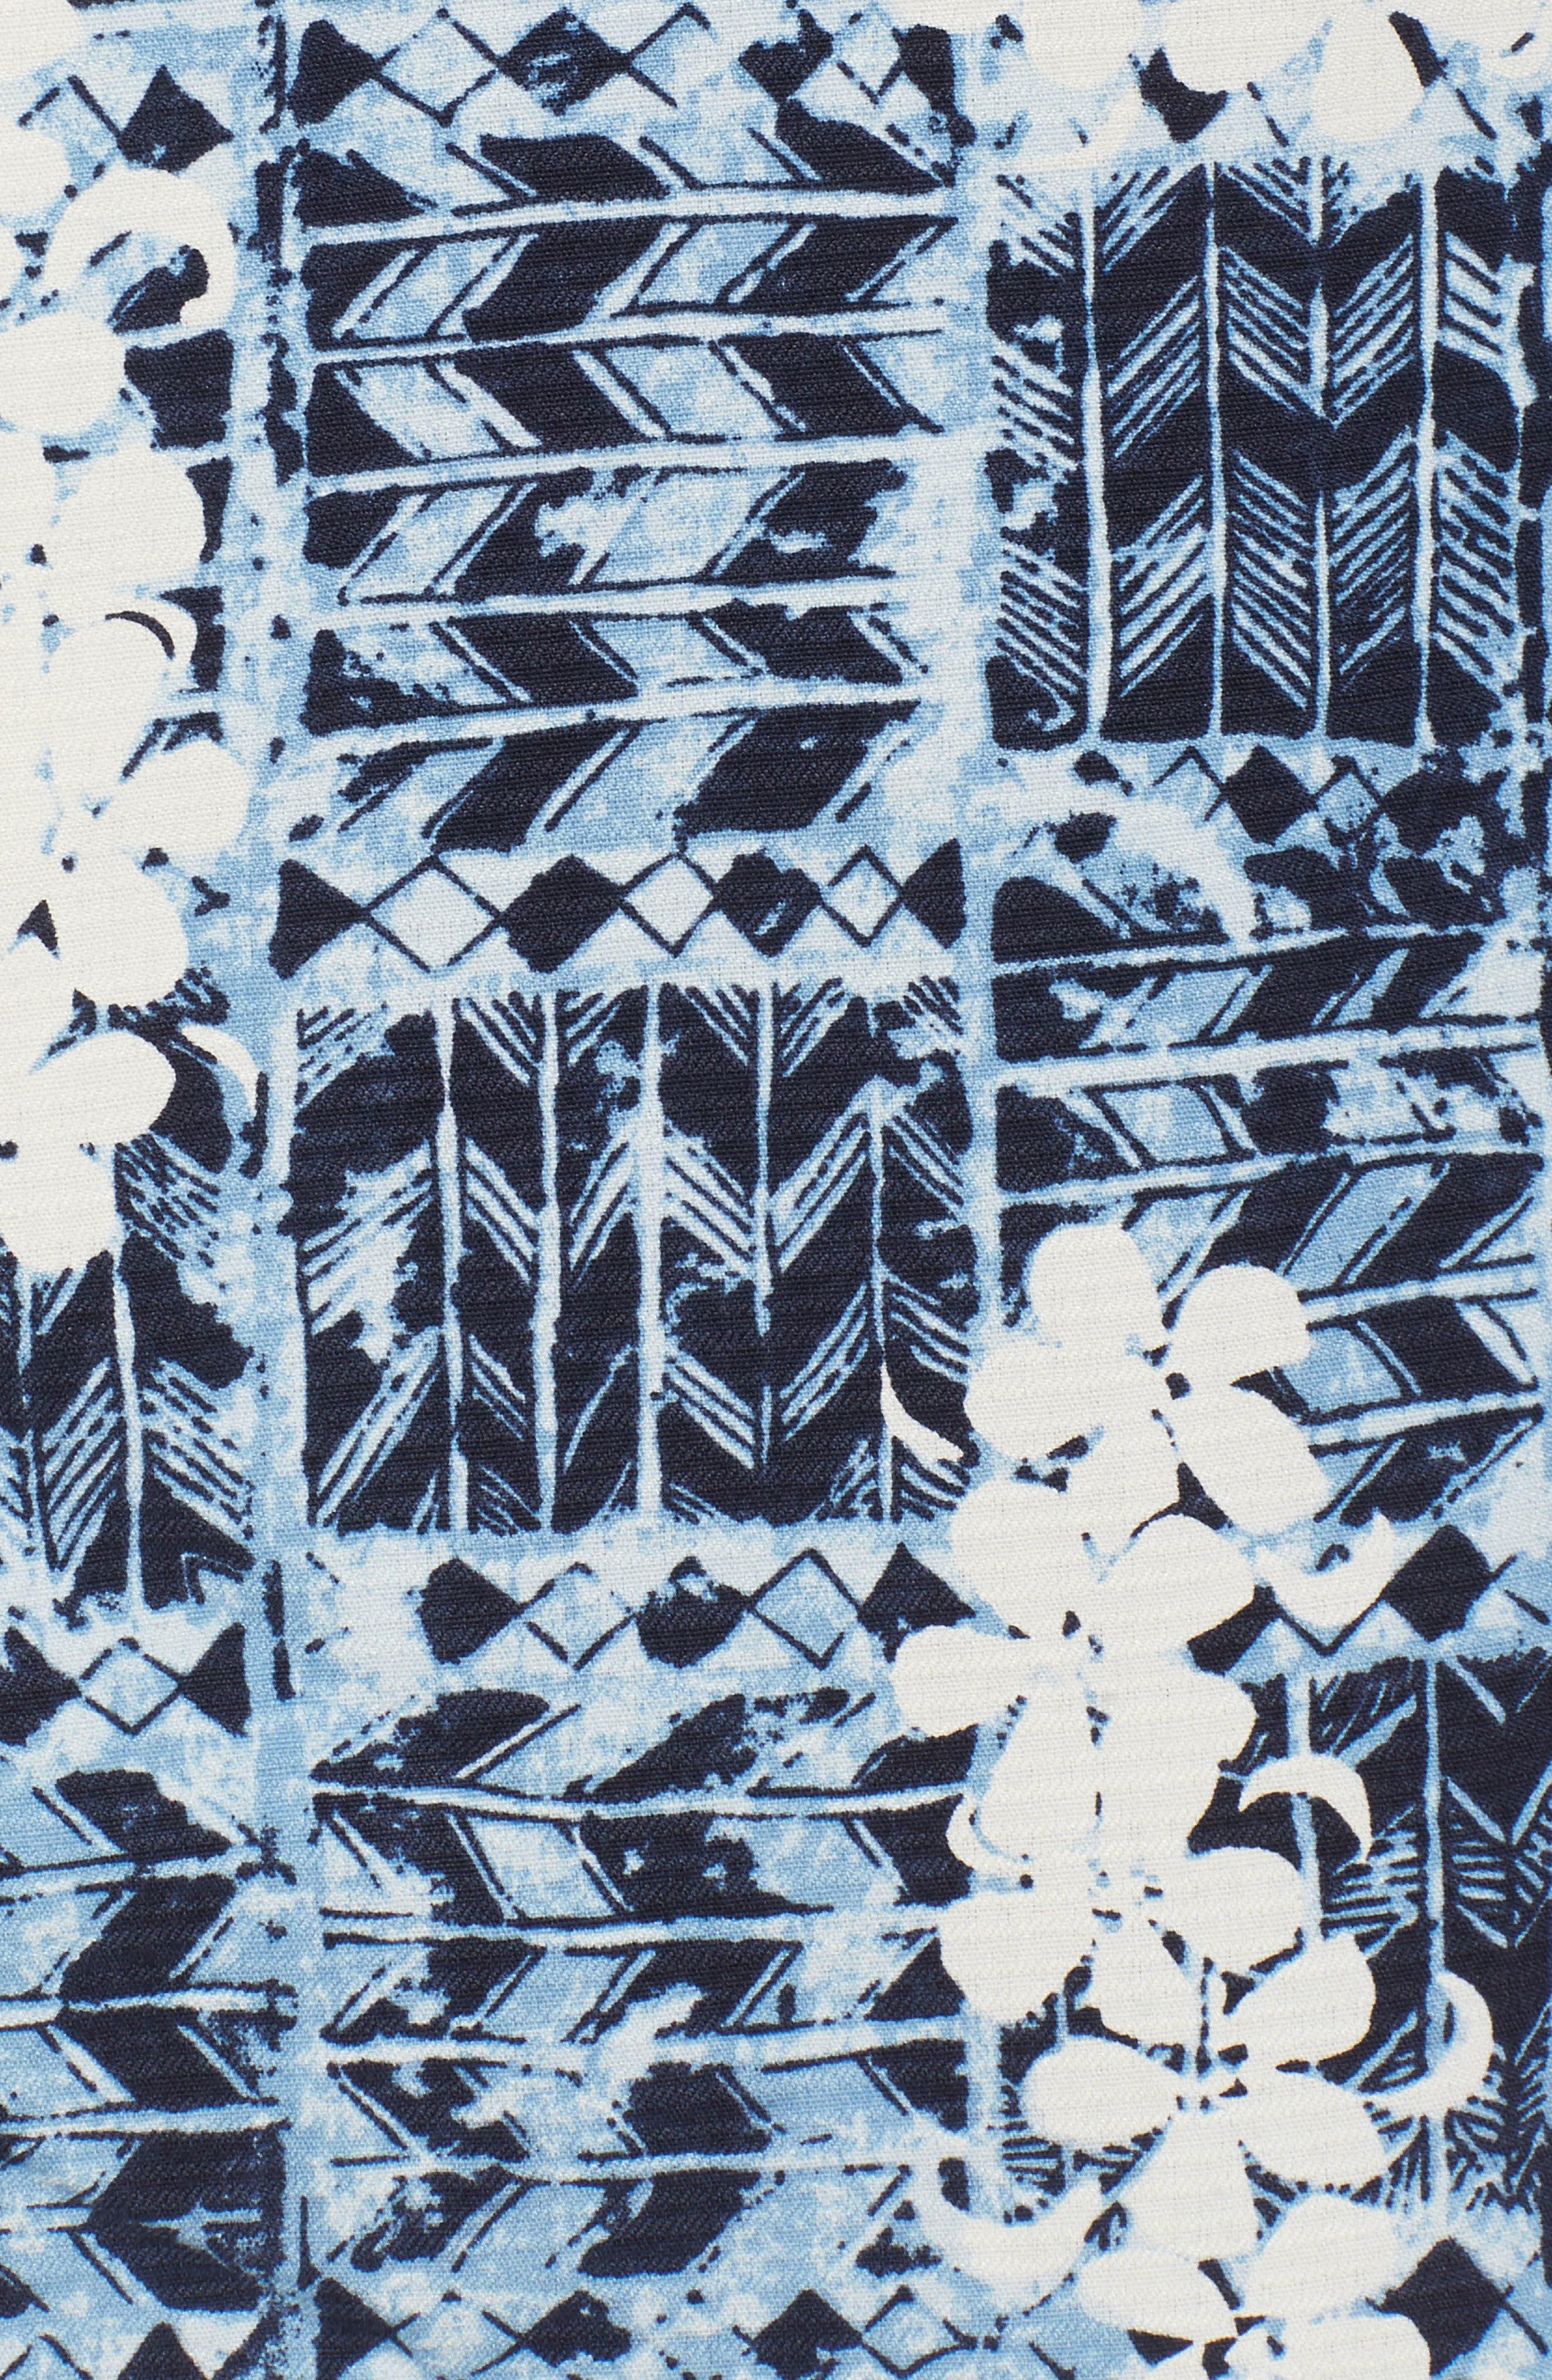 Olei Olei Silk Camp Shirt,                             Alternate thumbnail 5, color,                             Bering Blue